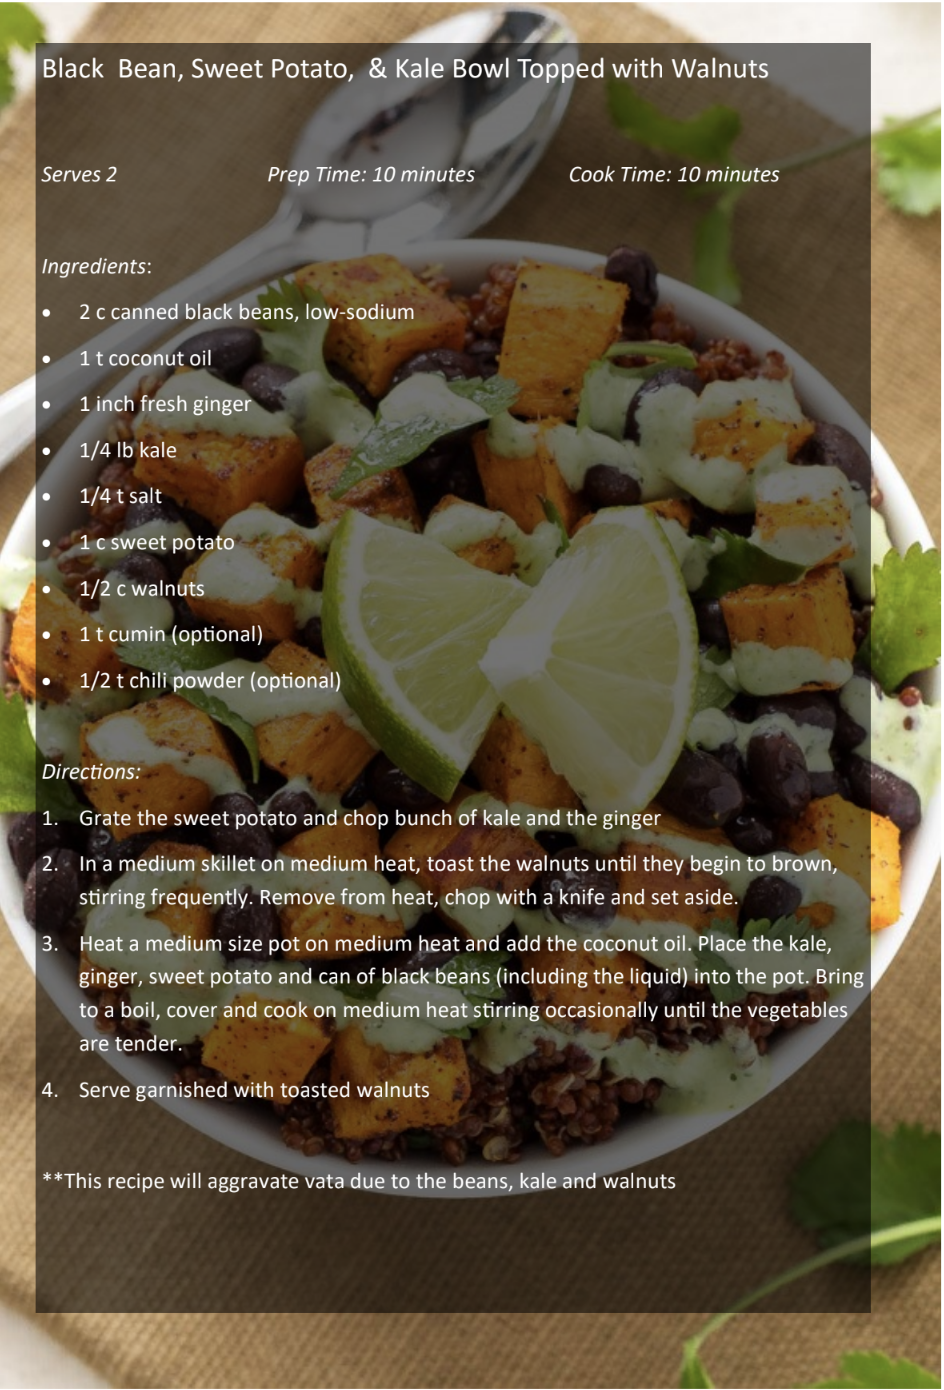 Black Bean, Sweet Potato & Kale Bowl Topped with Walnuts.png